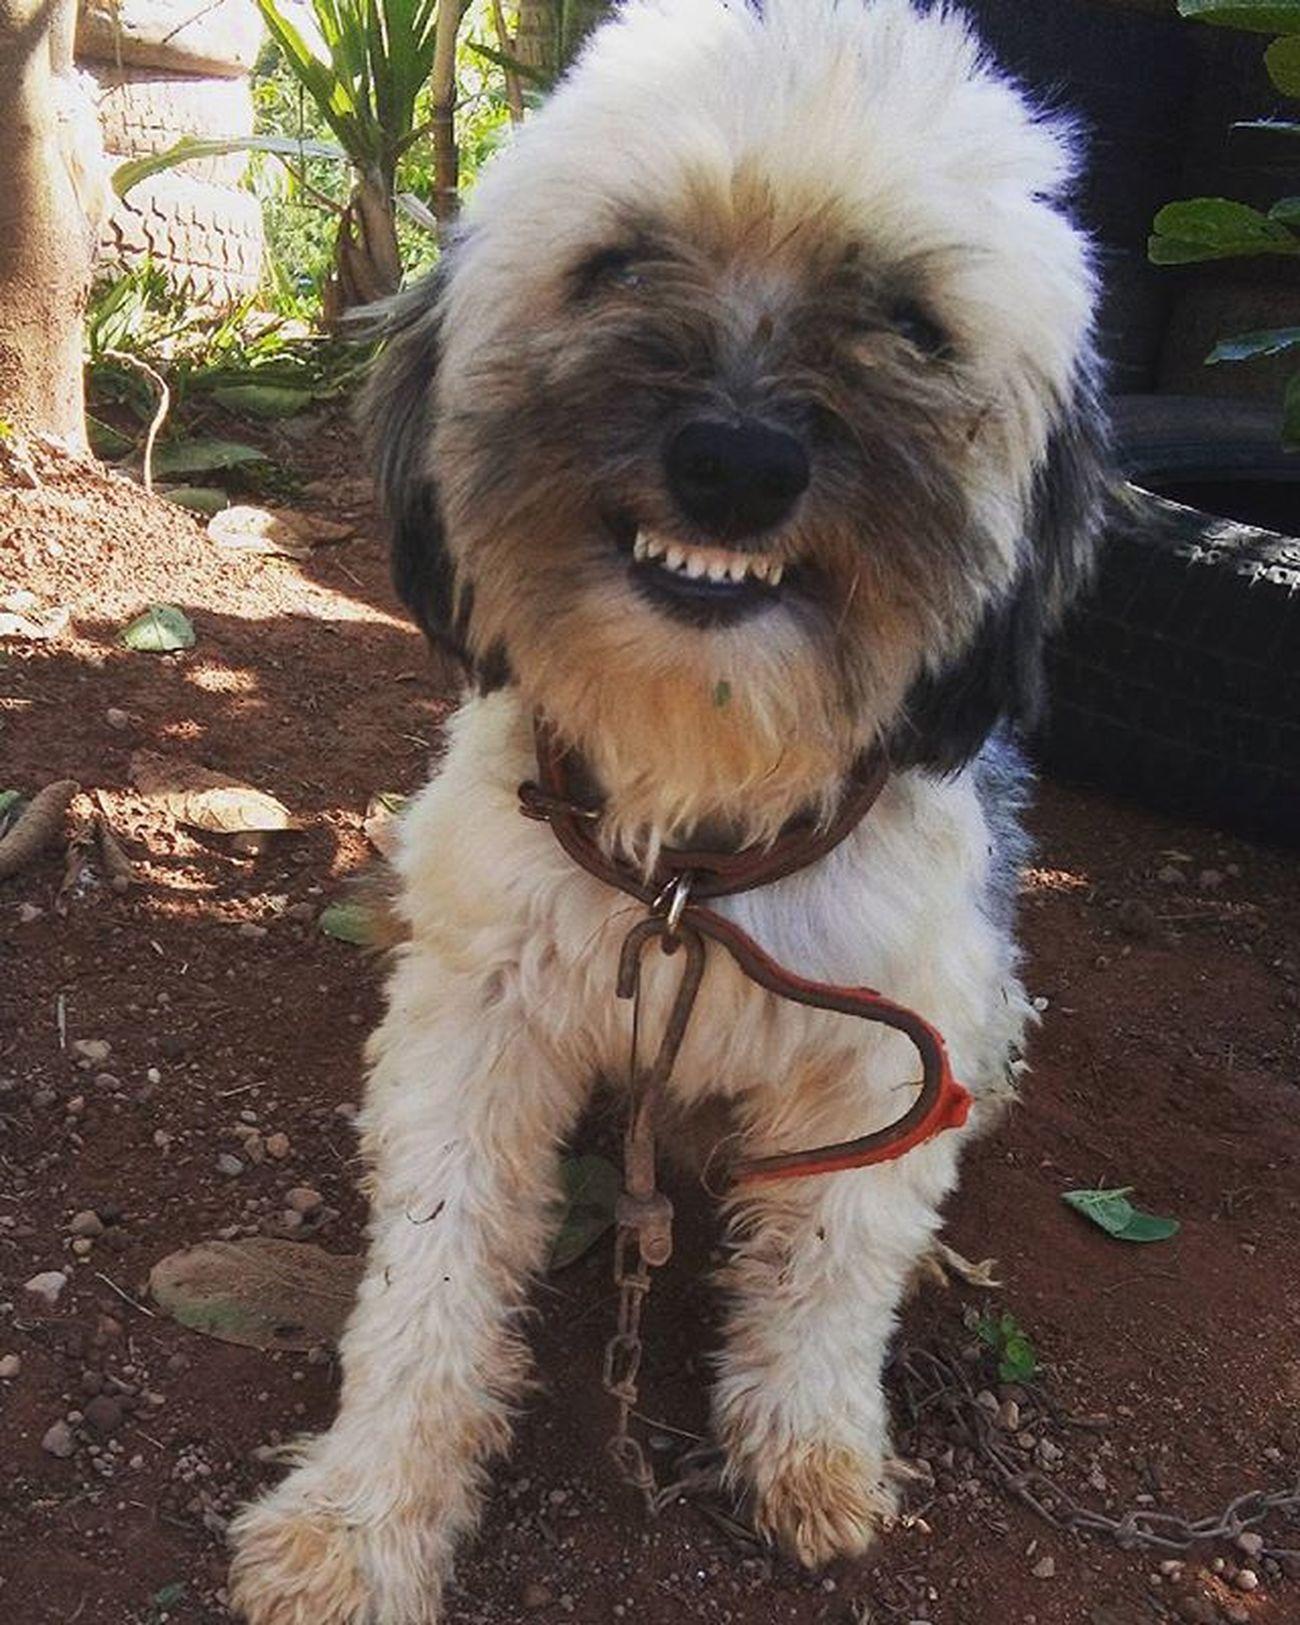 Instadog Mydog Ele voltou, olha o sorriso dele Intalove💓💗💋💞💕 Tommy.